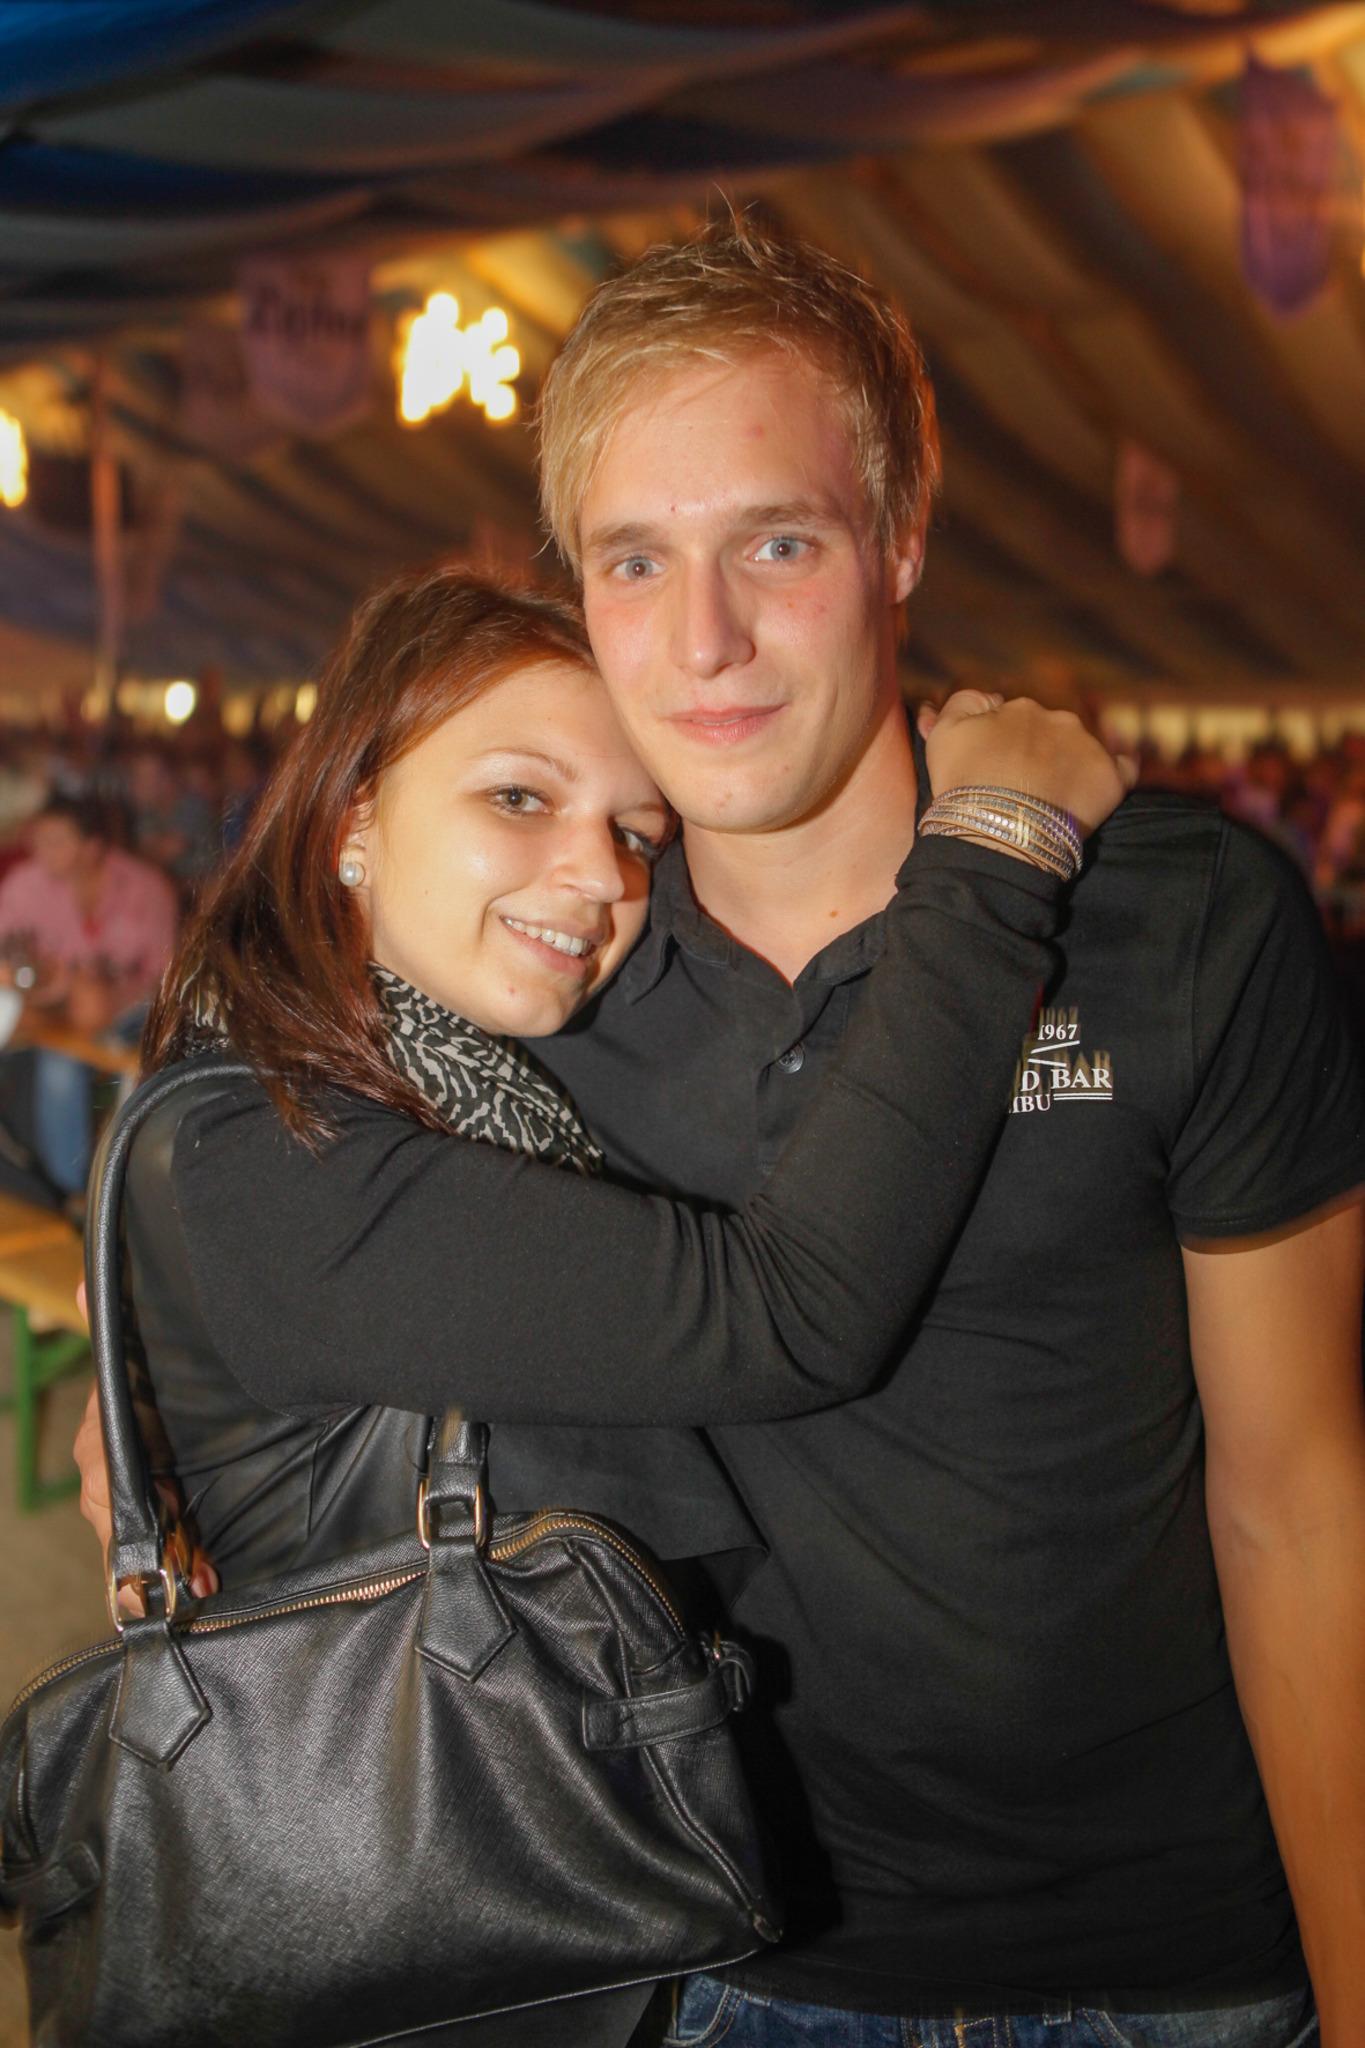 Kontaktanzeigen Lengau | Locanto Dating Lengau